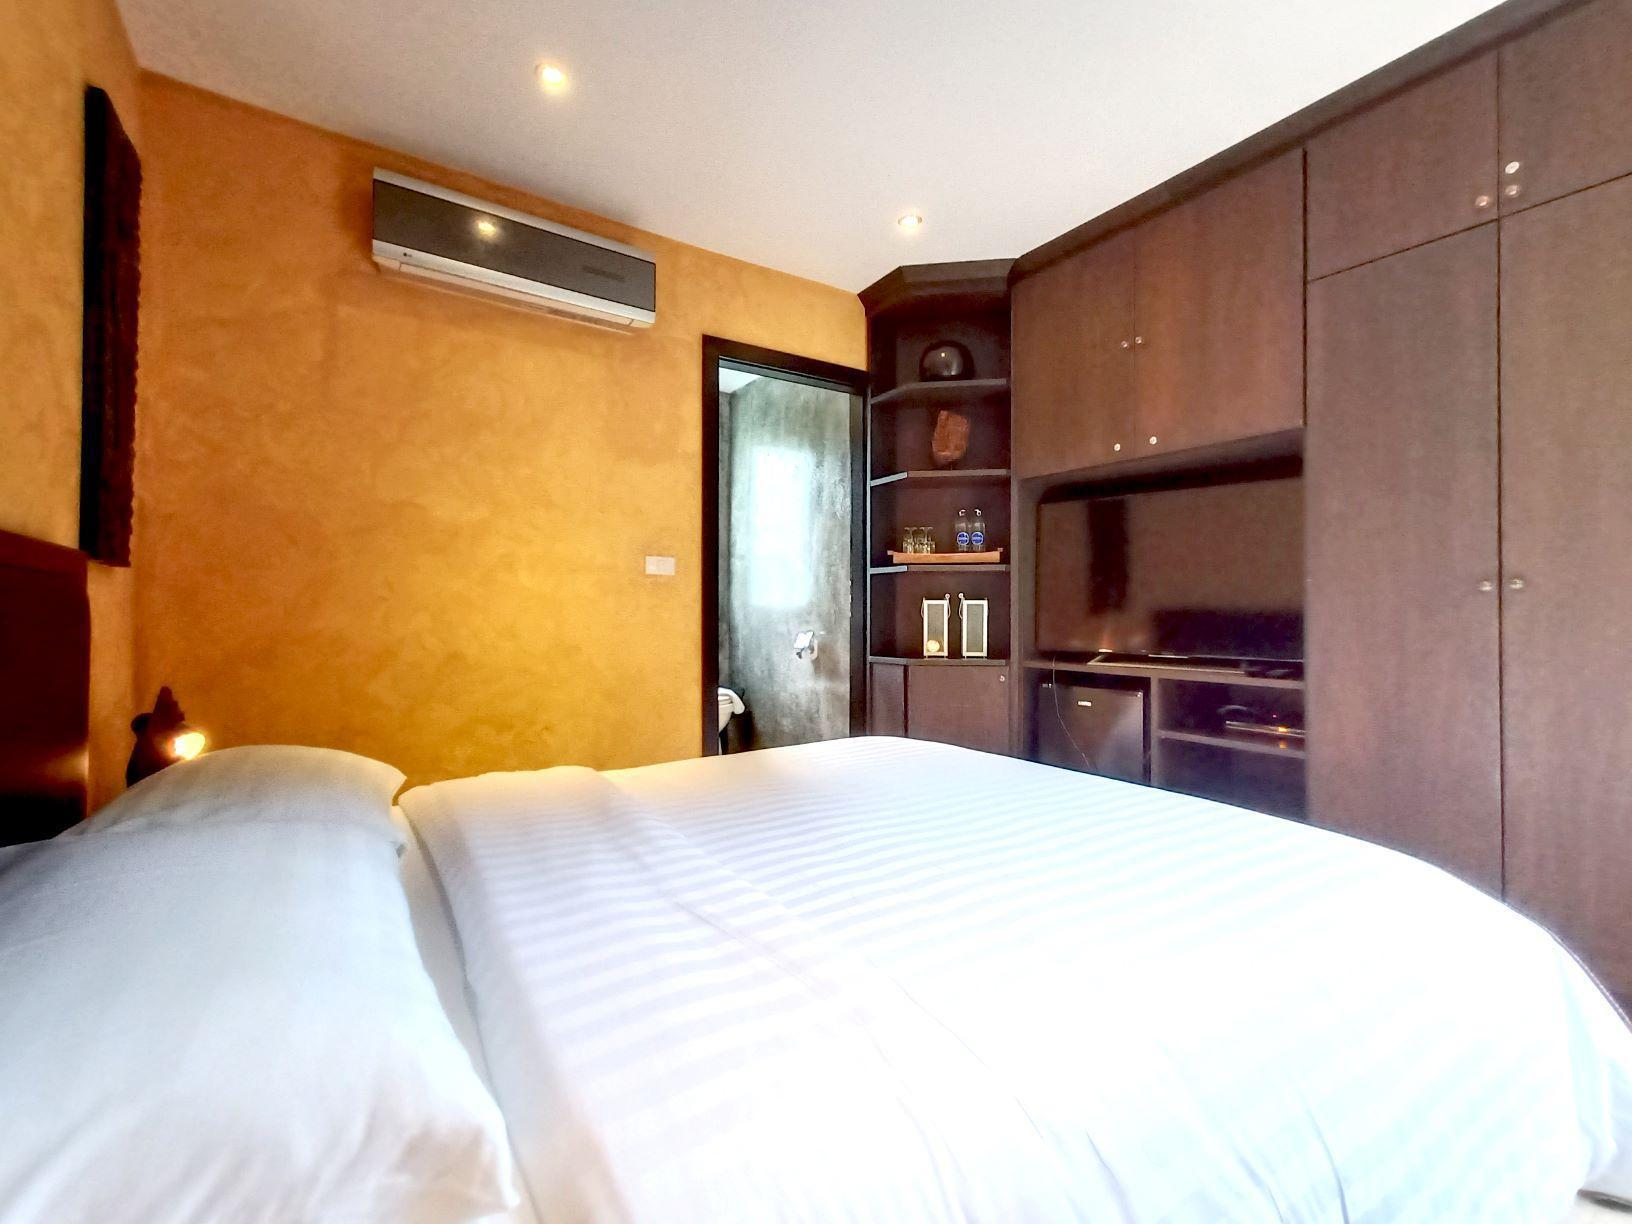 Red Sunset Villa Suite  With Pool  Hotel Managed วิลลา 1 ห้องนอน 1 ห้องน้ำส่วนตัว ขนาด 80 ตร.ม. – คลองสน